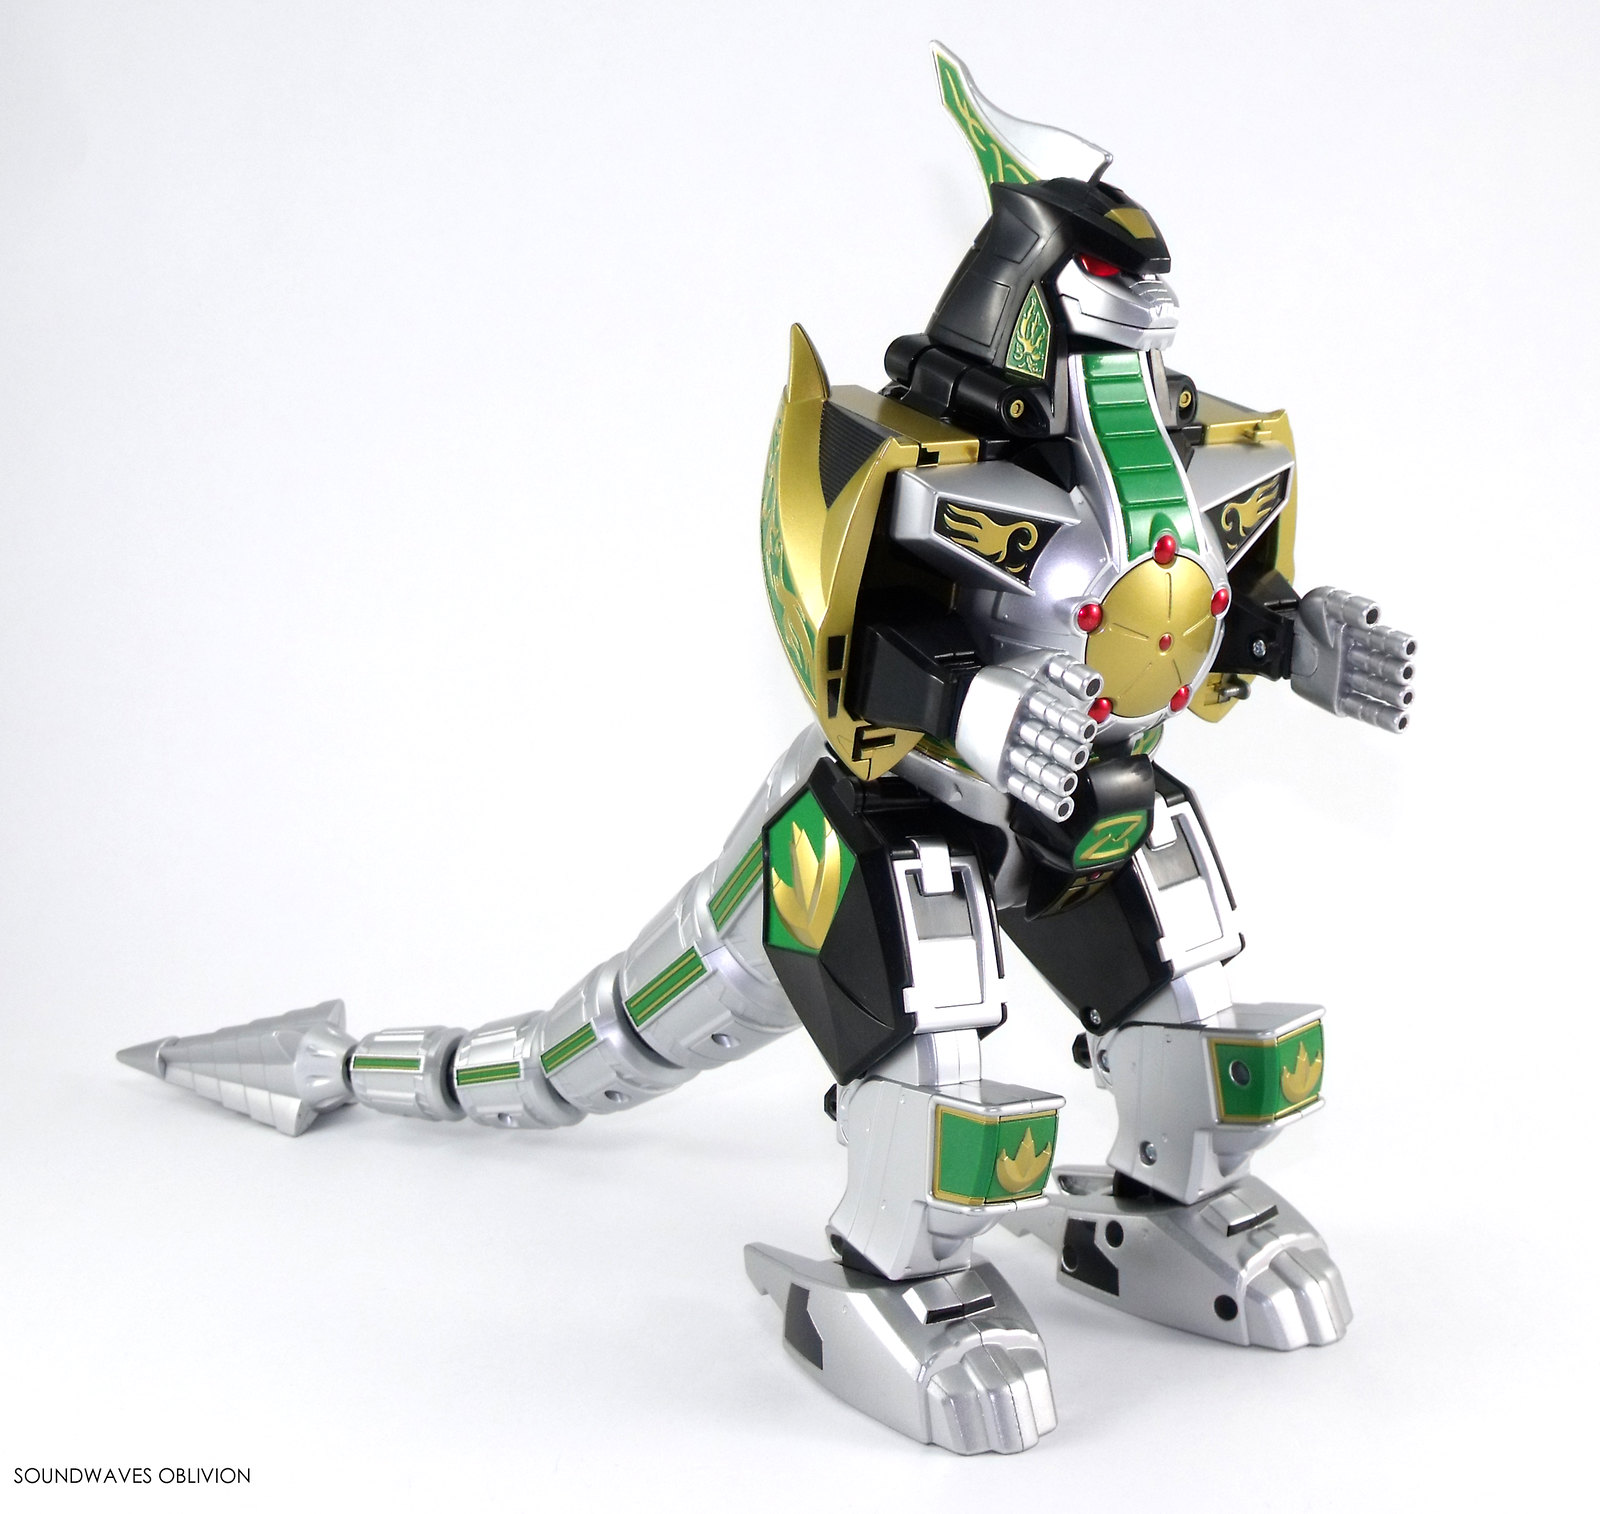 Mighty morphin power rangers titanus